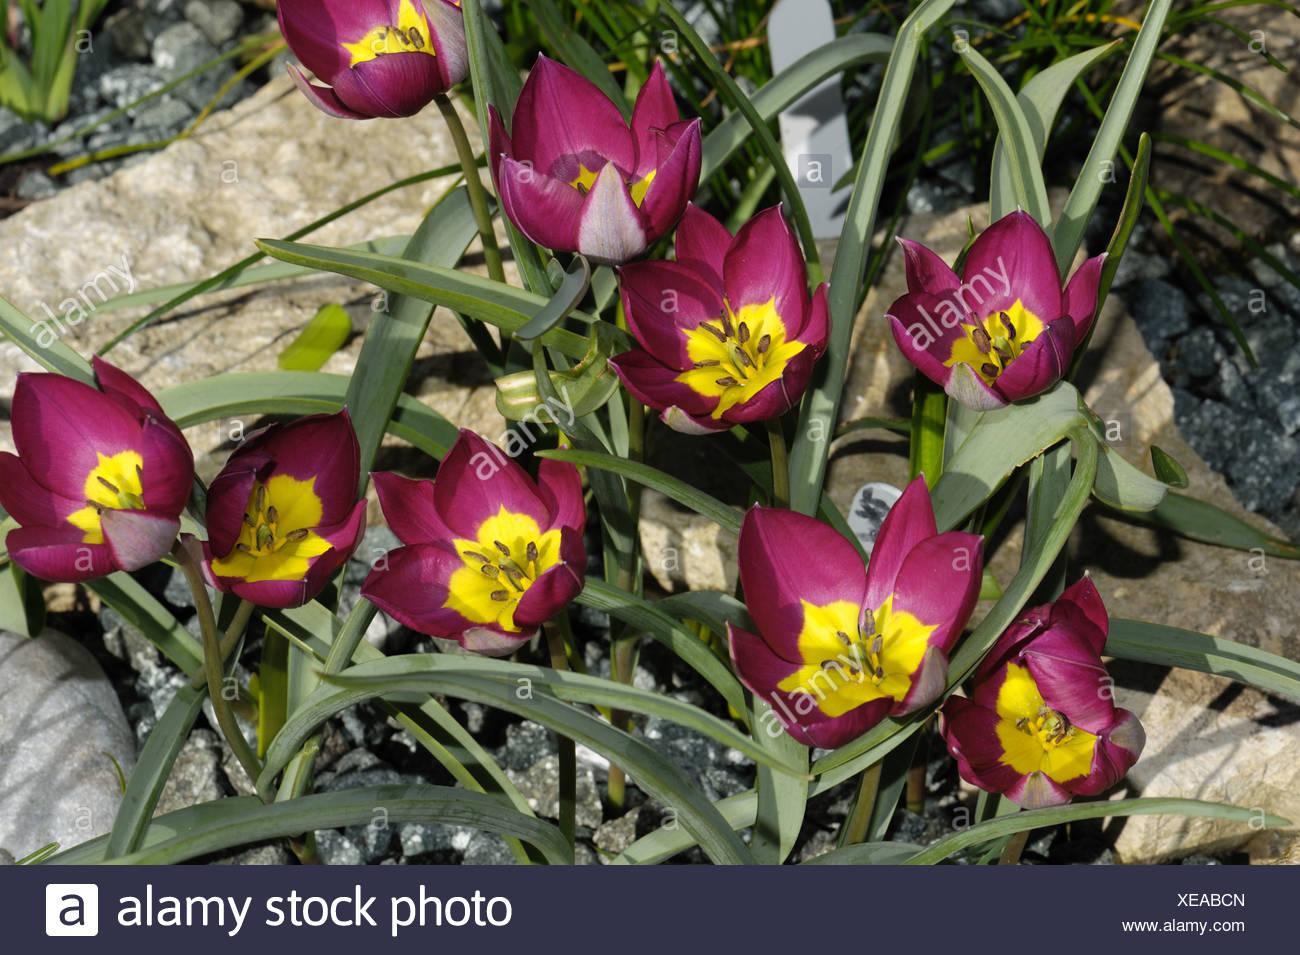 Flowers of species tulip Tulipa pulchella Persian Pearl - Stock Image